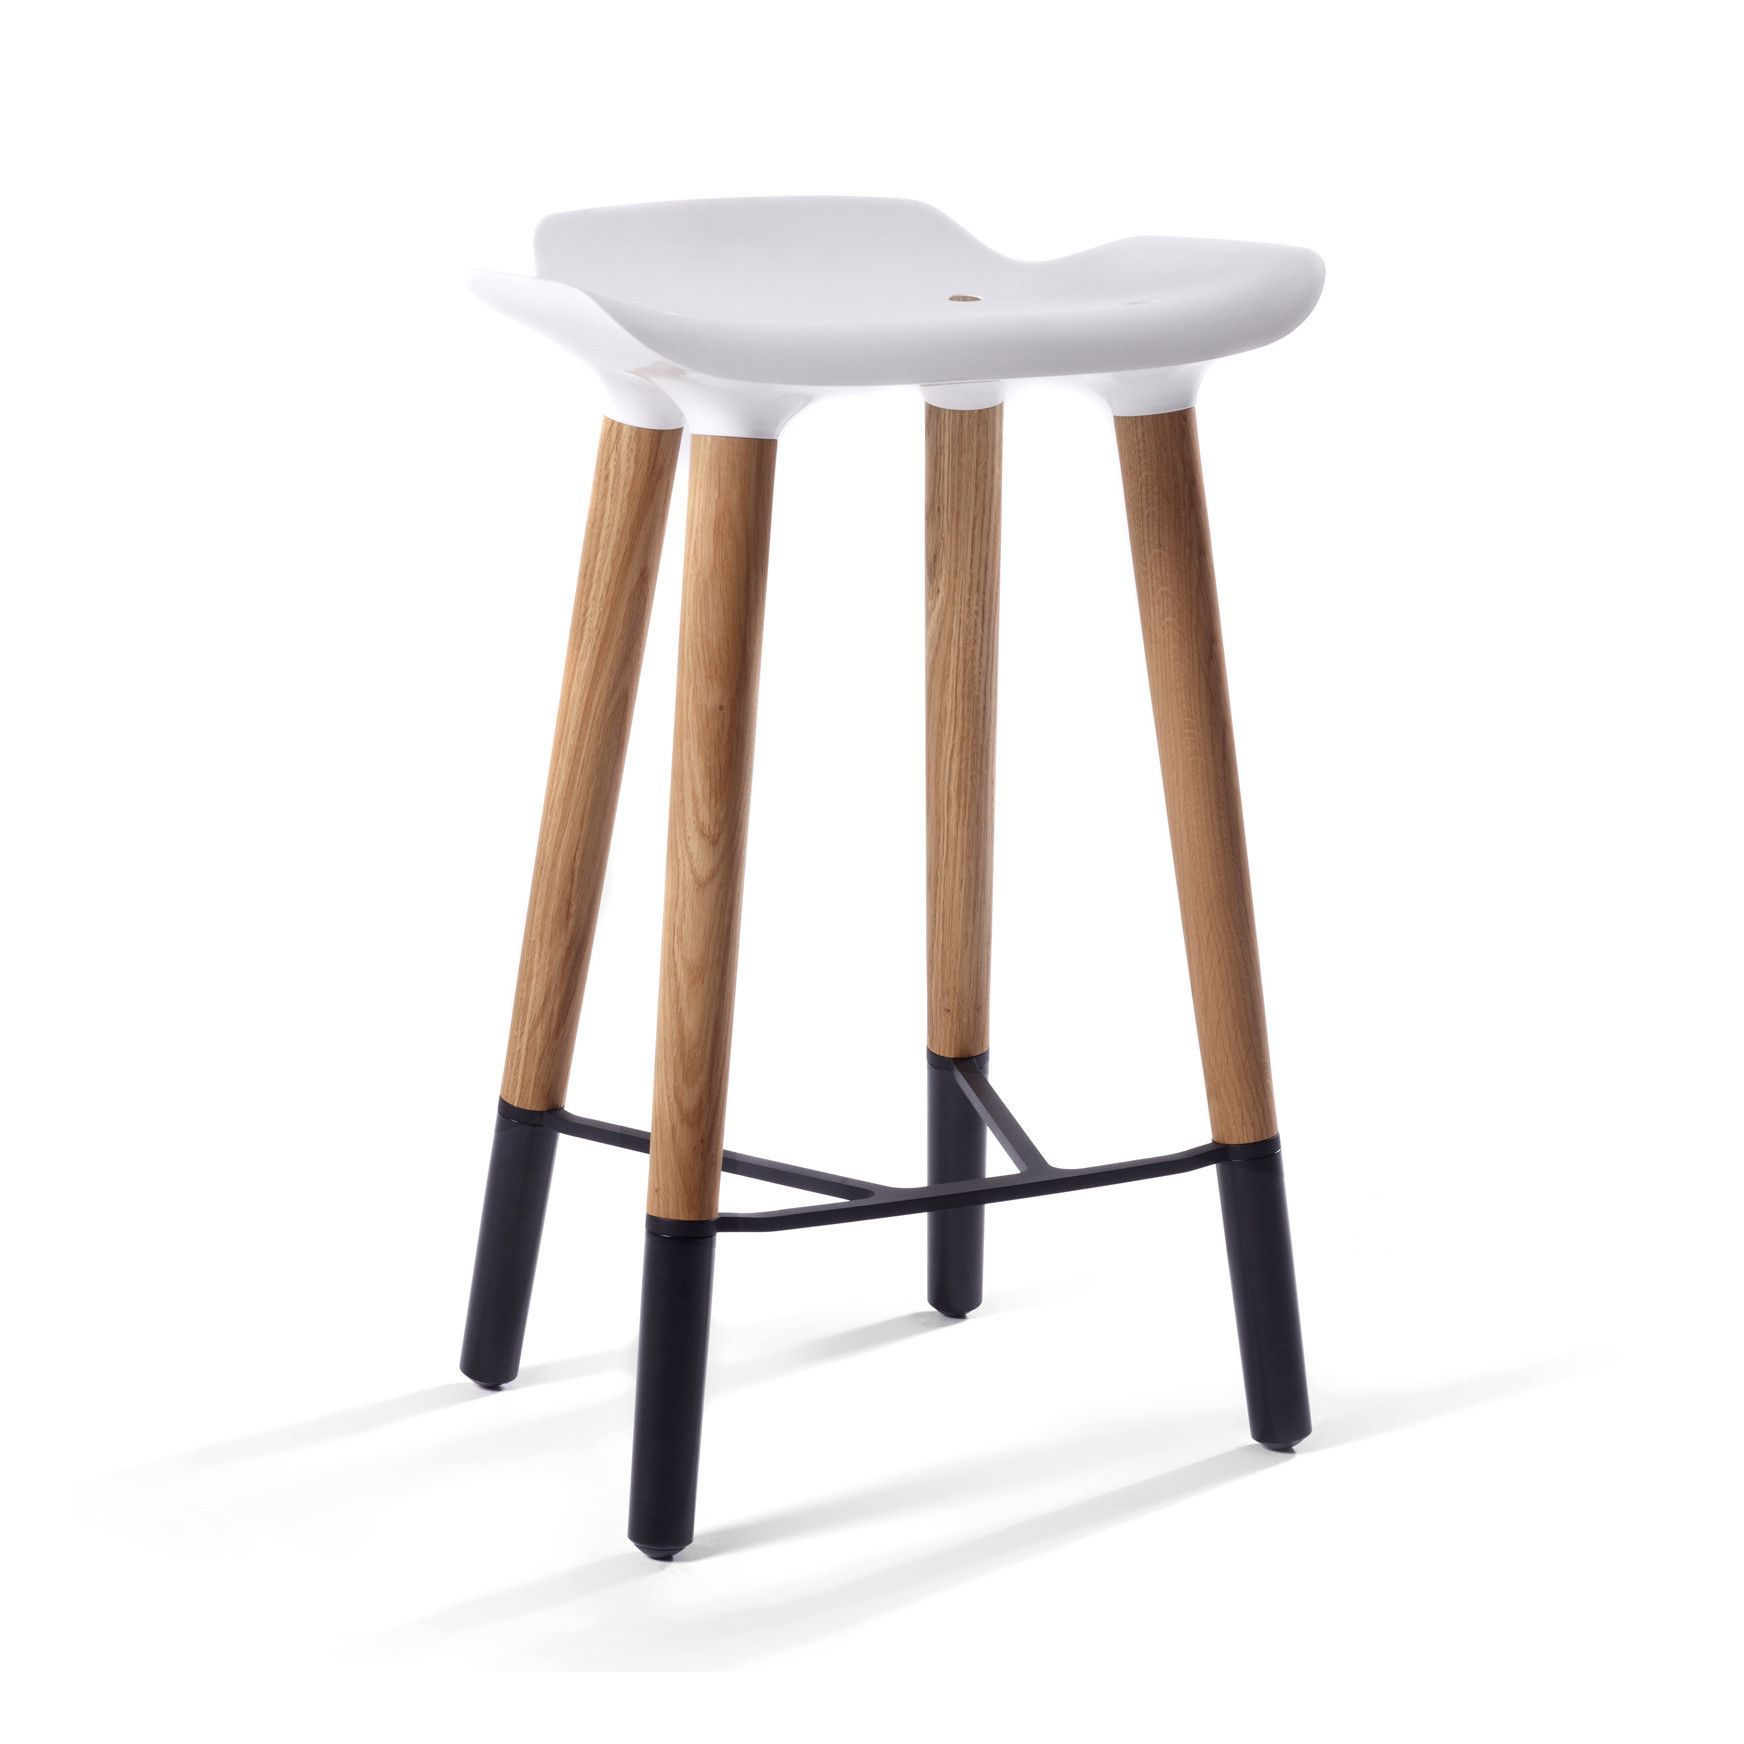 Pluto Danish Modern Counter Stool with White Seat  sc 1 st  Pinterest & Pluto Danish Modern Counter Stool with White Seat | / FURNITURE ... islam-shia.org